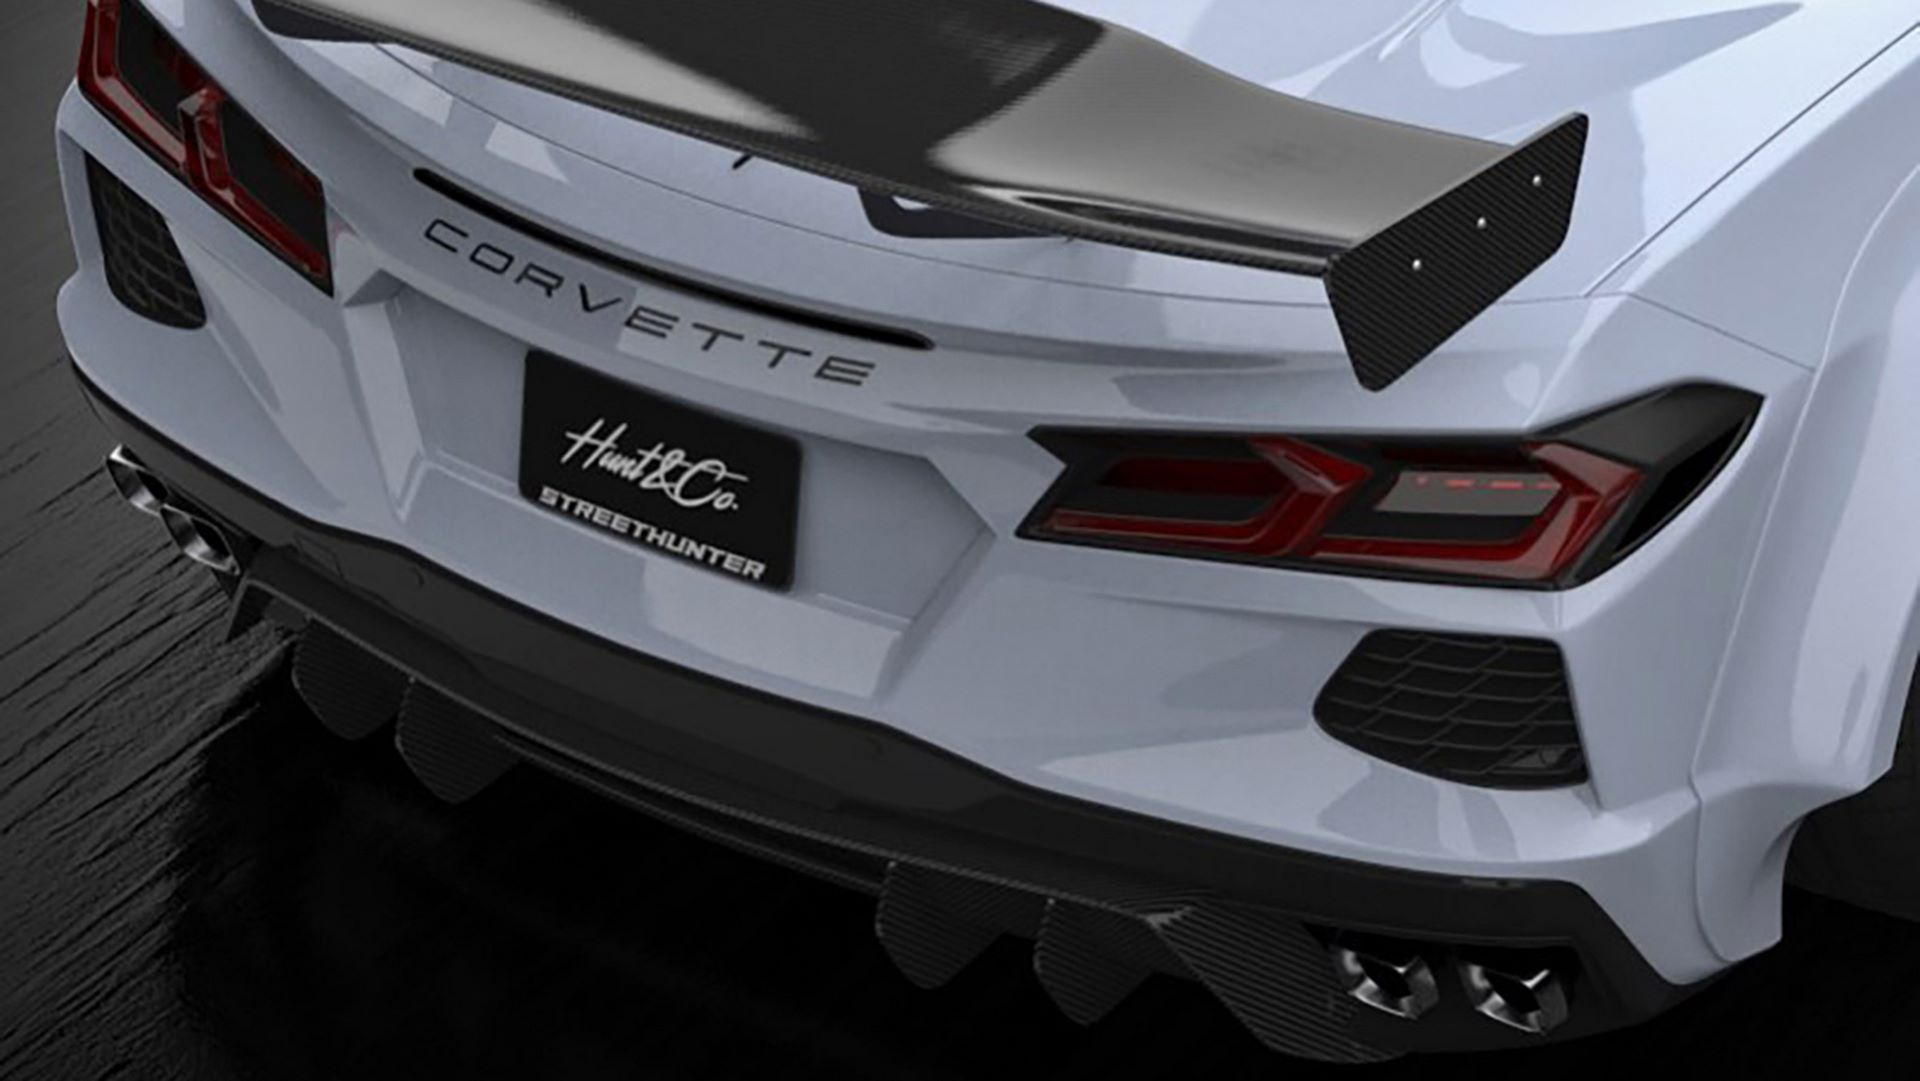 Streethunter-Chevrolet-Corvette-C8-Widebody-10